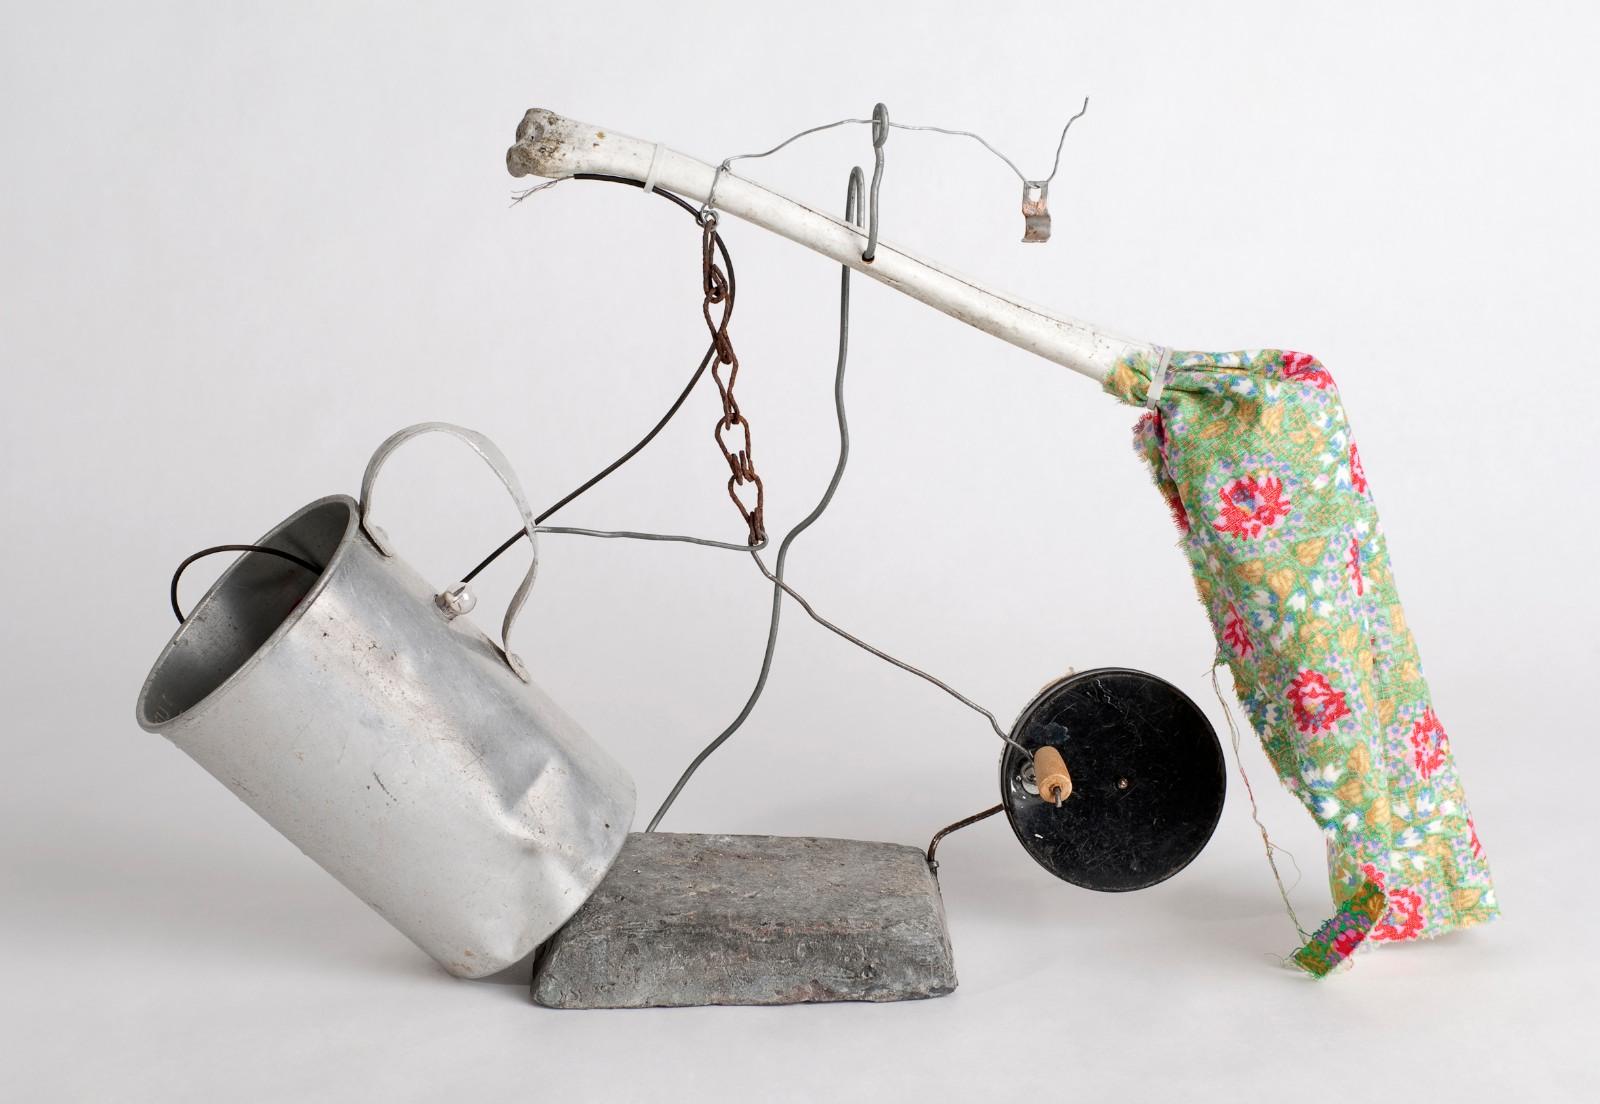 Studie (öra), 2009, assemblage, 31 x 41 x 10 cm